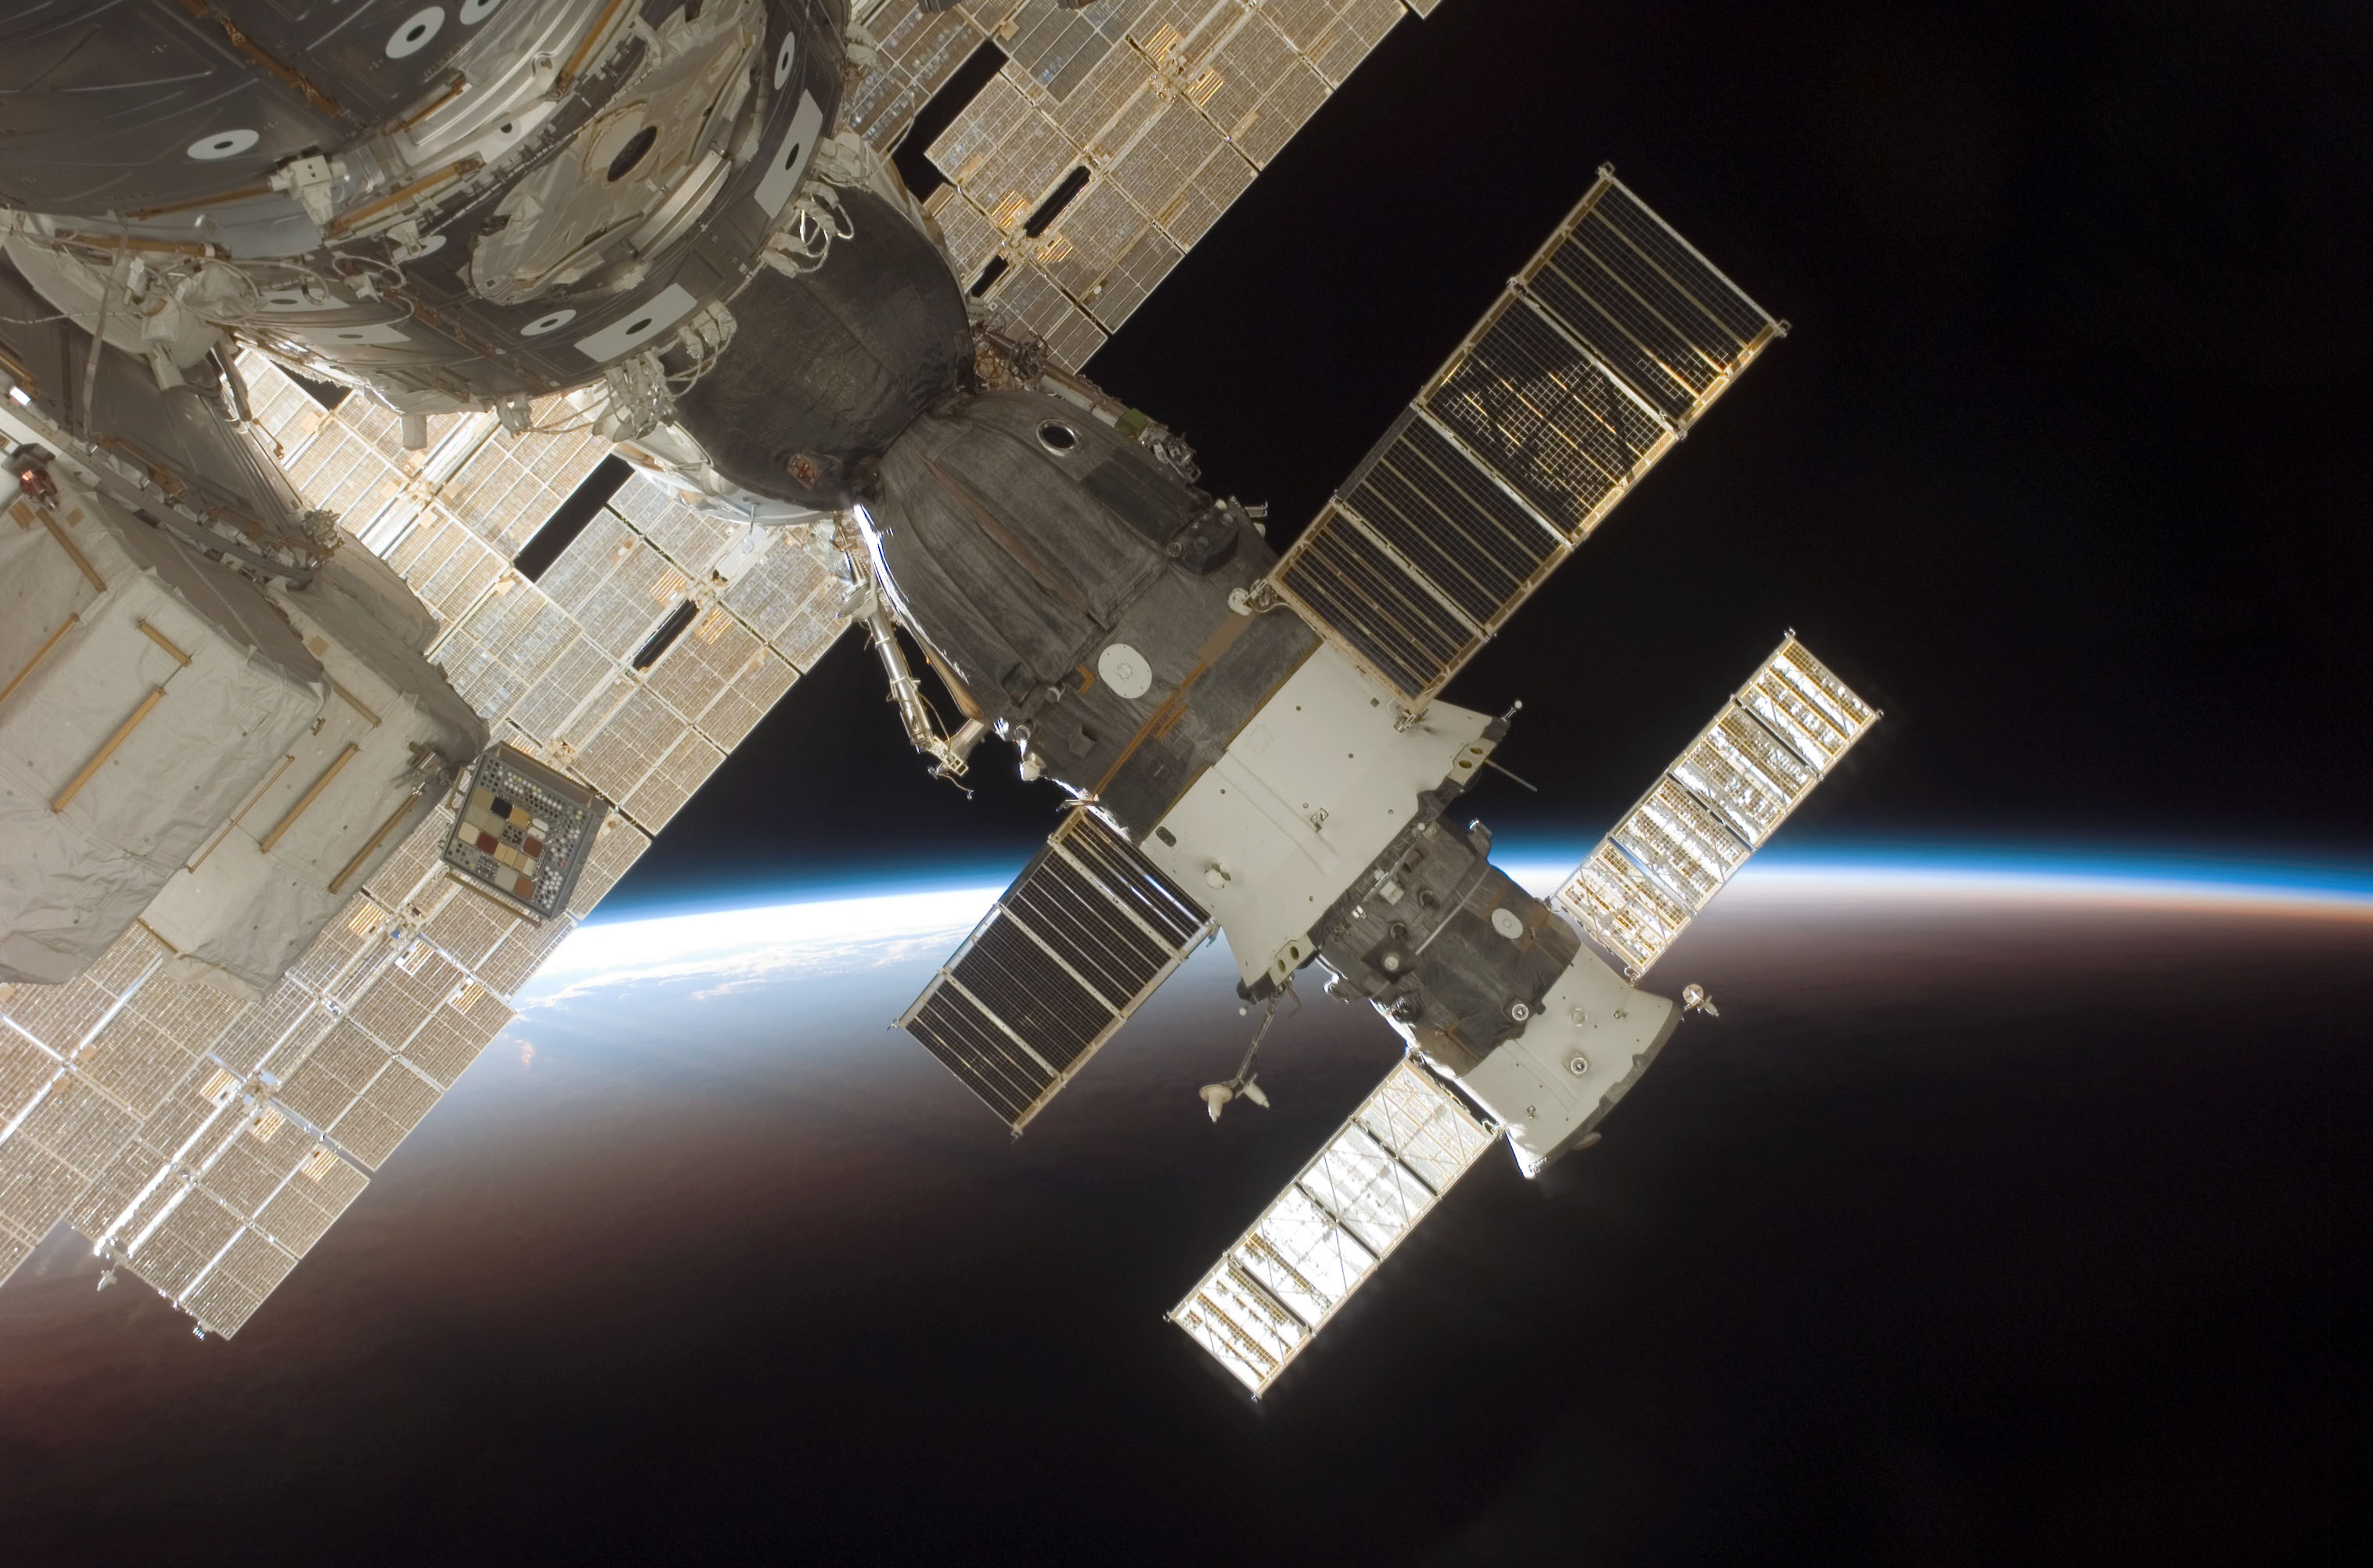 Bilddatei: International-space-station(C)NASA.jpg